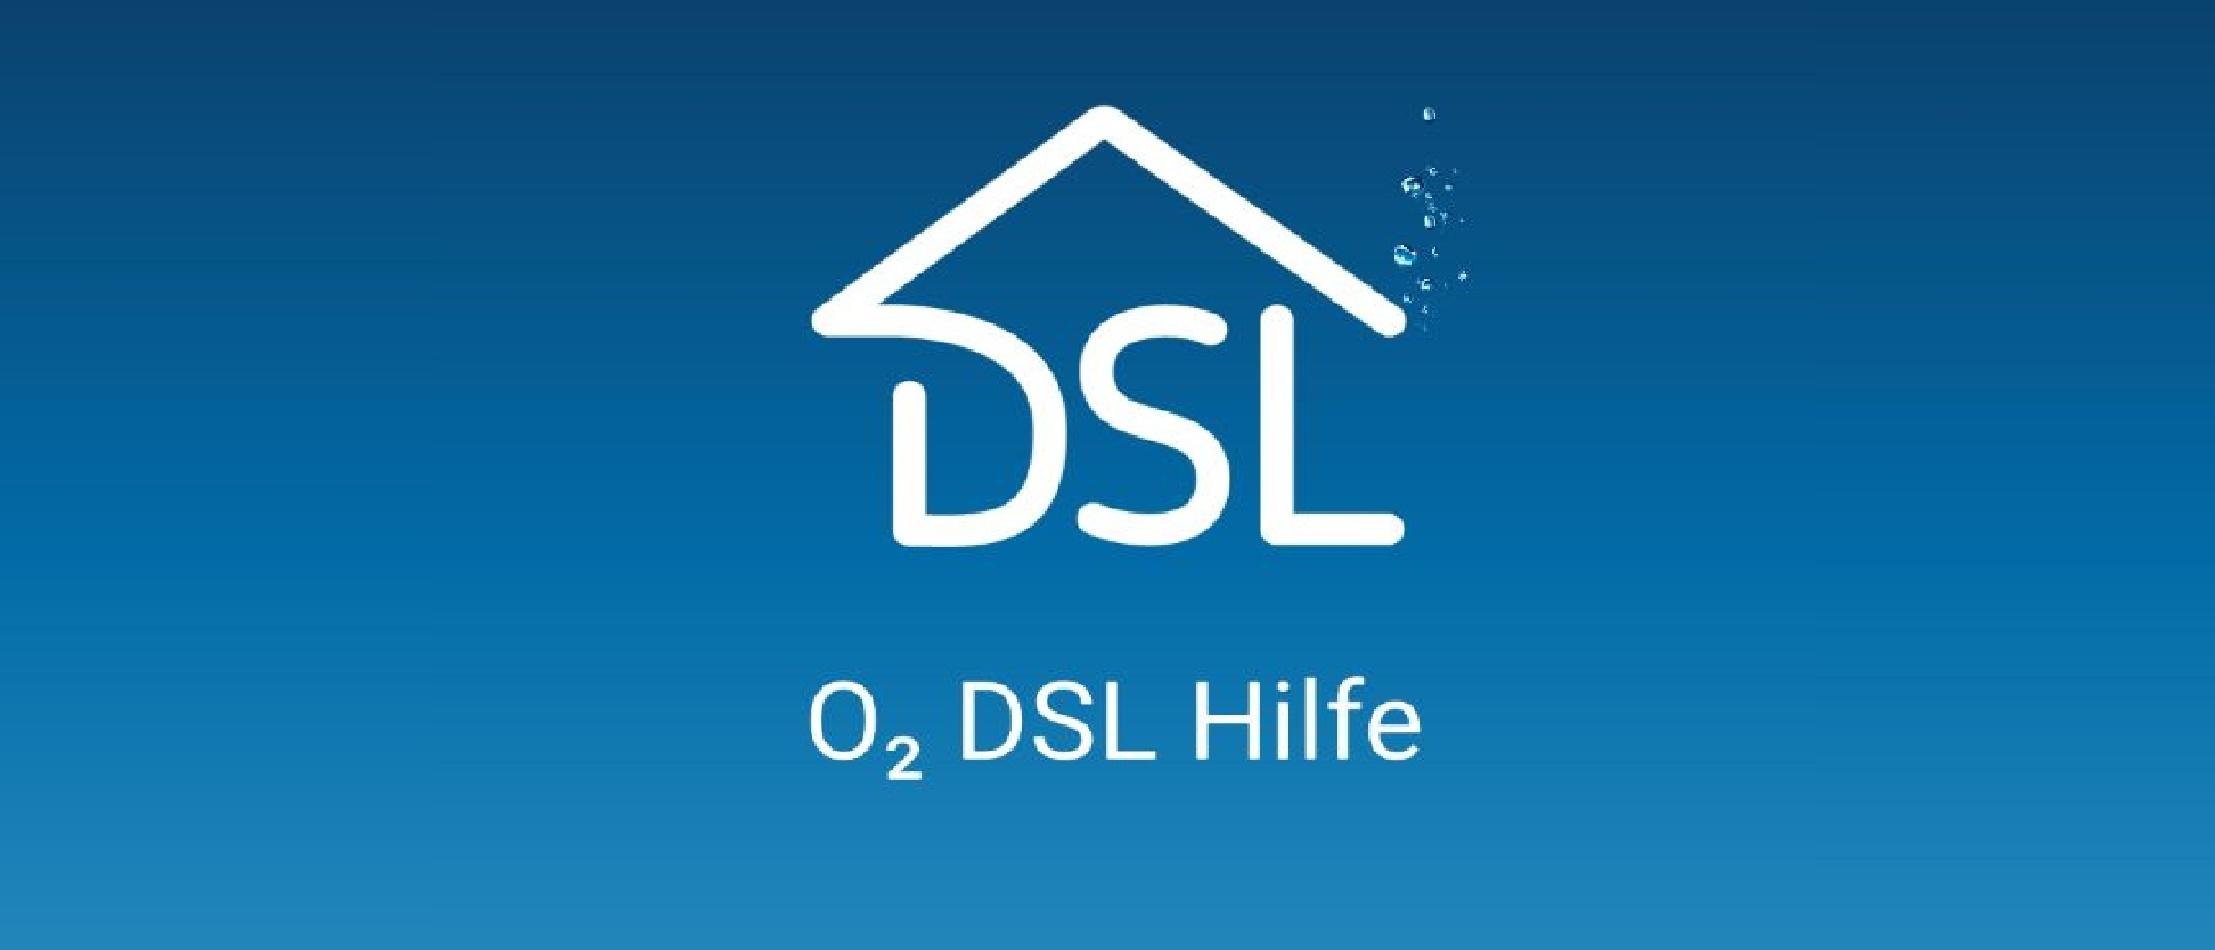 Was kann die o2 DSL Hilfe App?